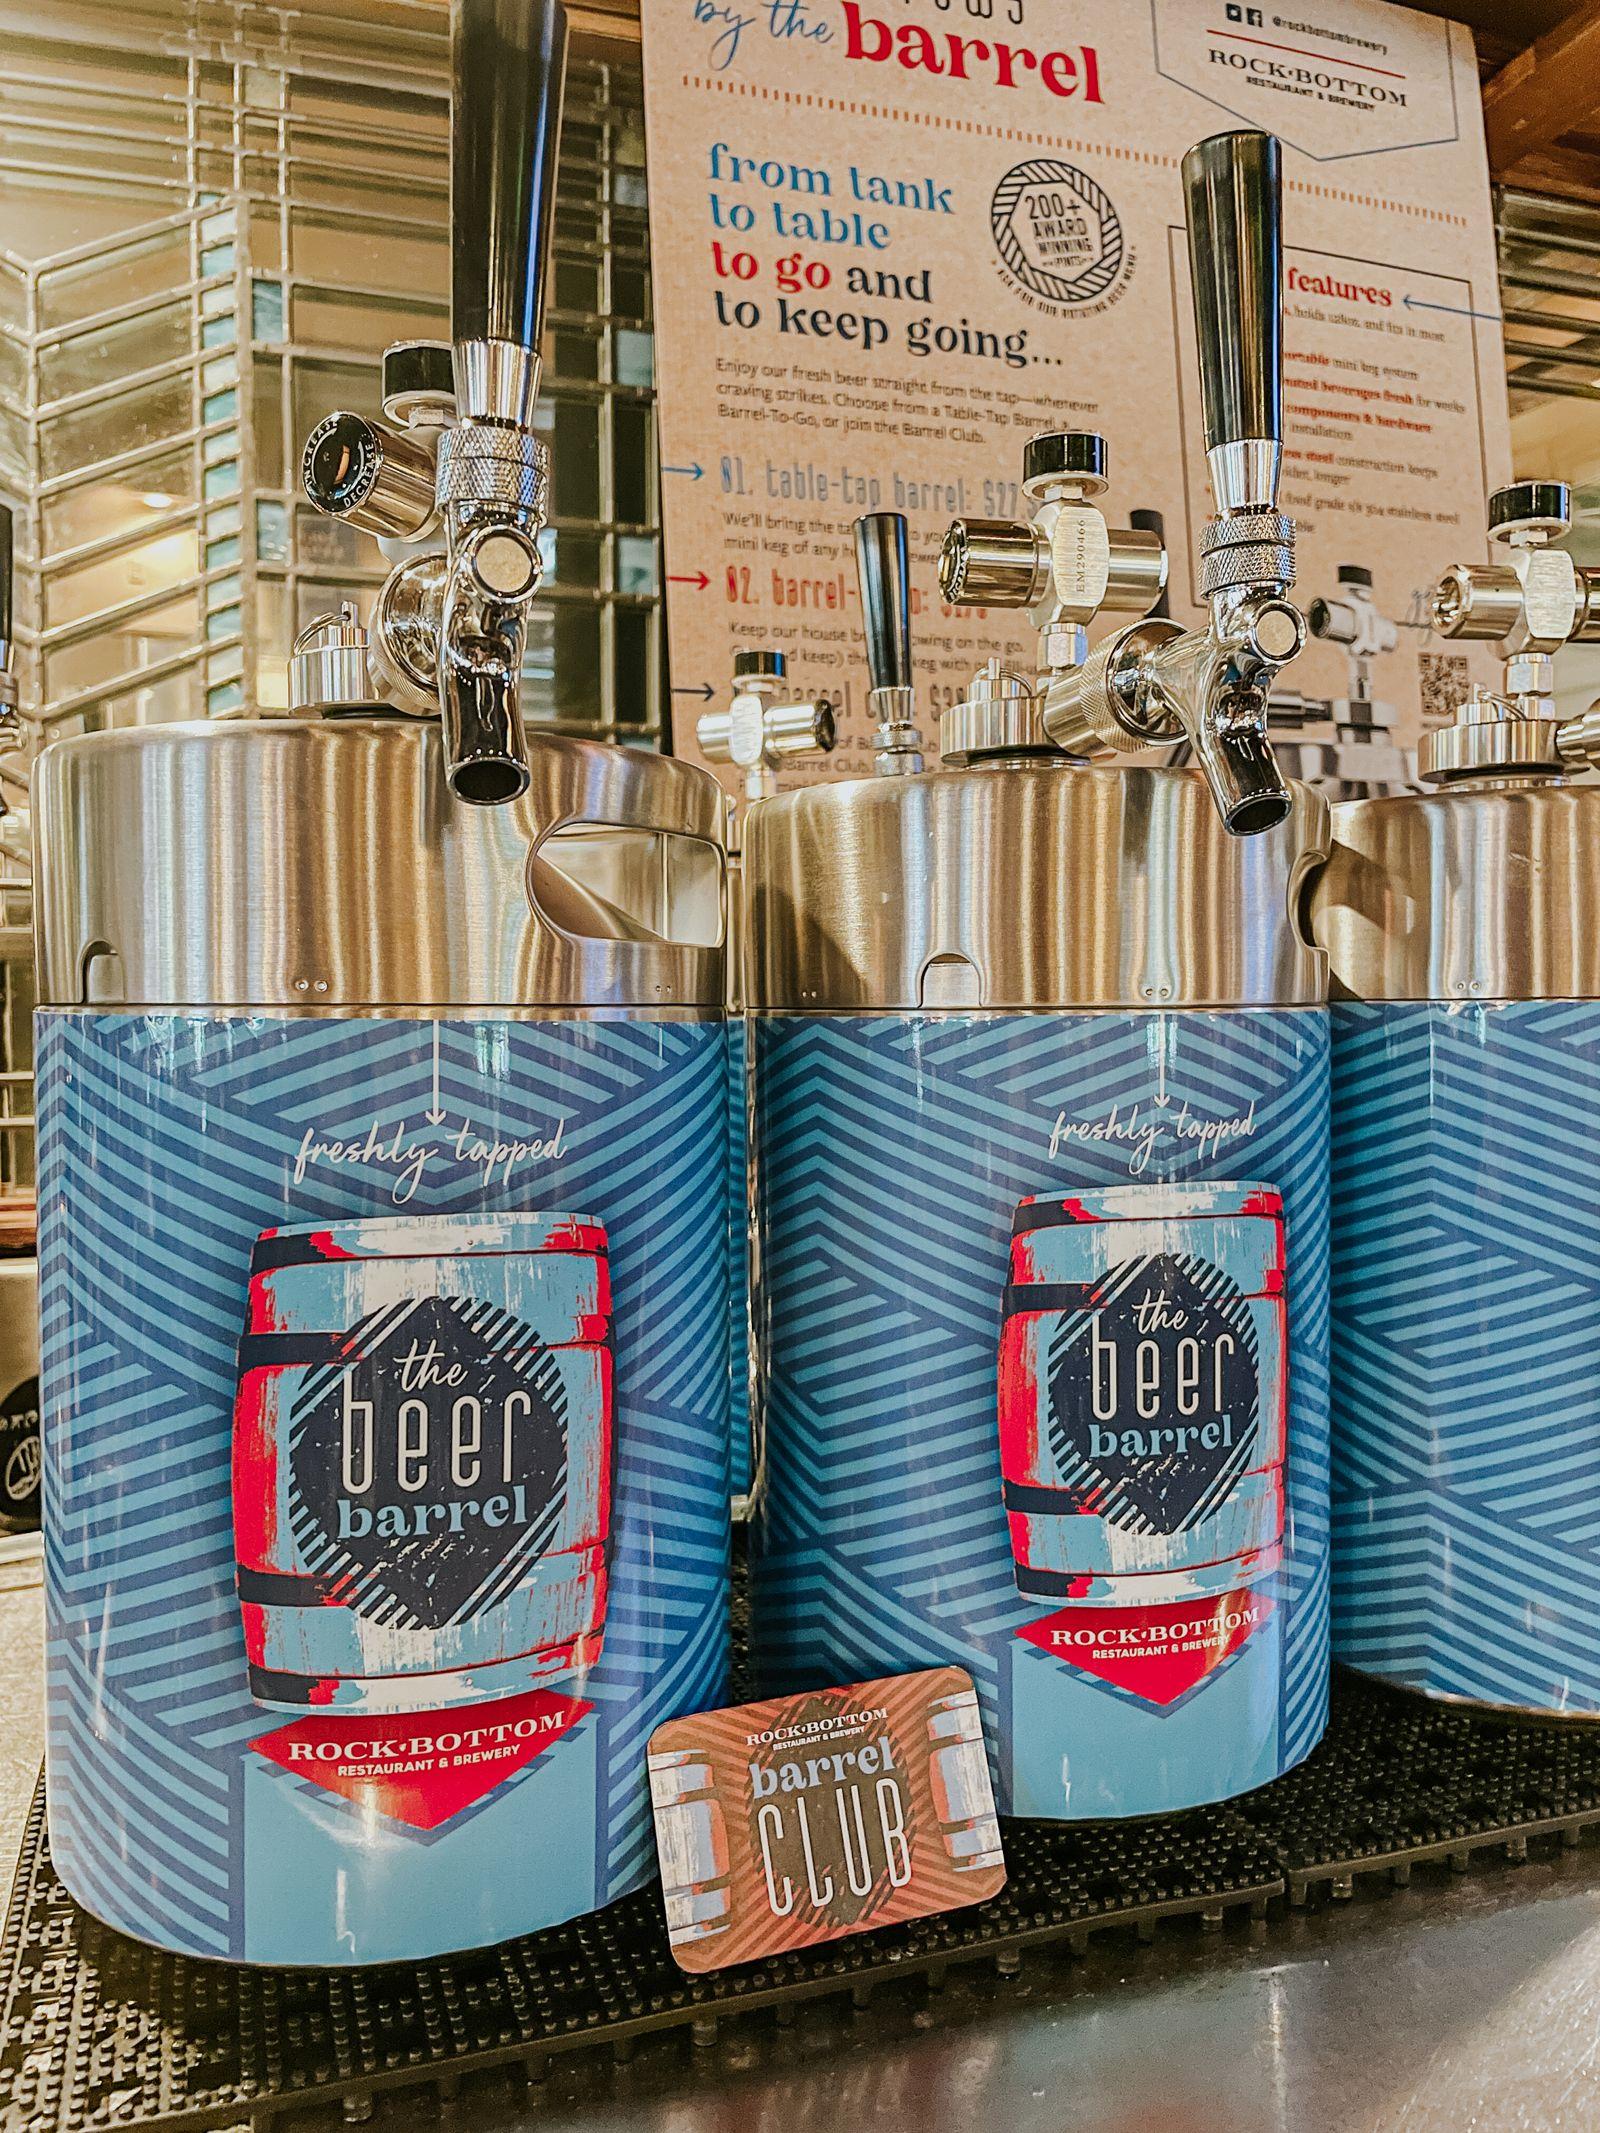 Rock Bottom Debuts Beer Club with 'First-Of-Its-Kind' Mini Keg Beer Barrels